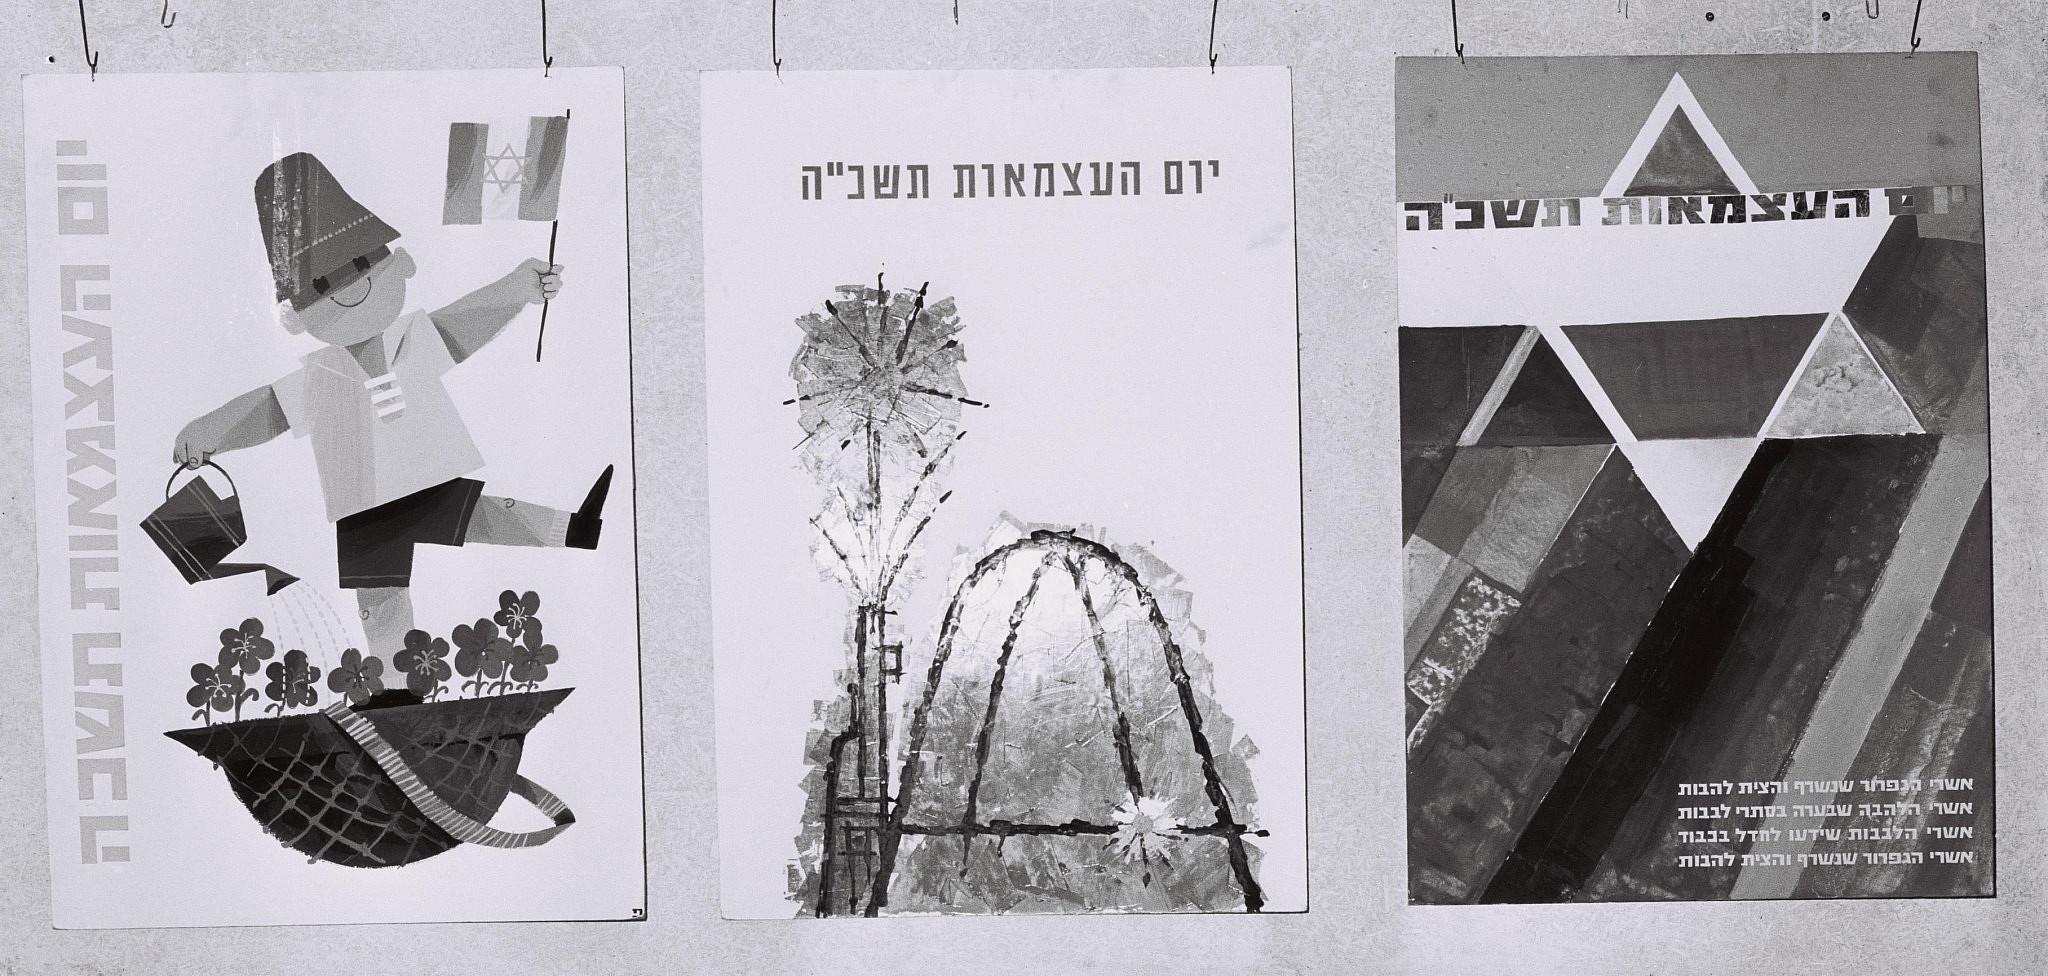 THREE PRIZE WINNING POSTER FOR INDEPENDENCE DAY 1965. L-R, 1ST PRIZE AMRAM PRATT, 2ND PRIZE ASHER KALDERON, 3RD PRIZE ELI SOULIMAN. Picture: COHEN FRITZ, GPO